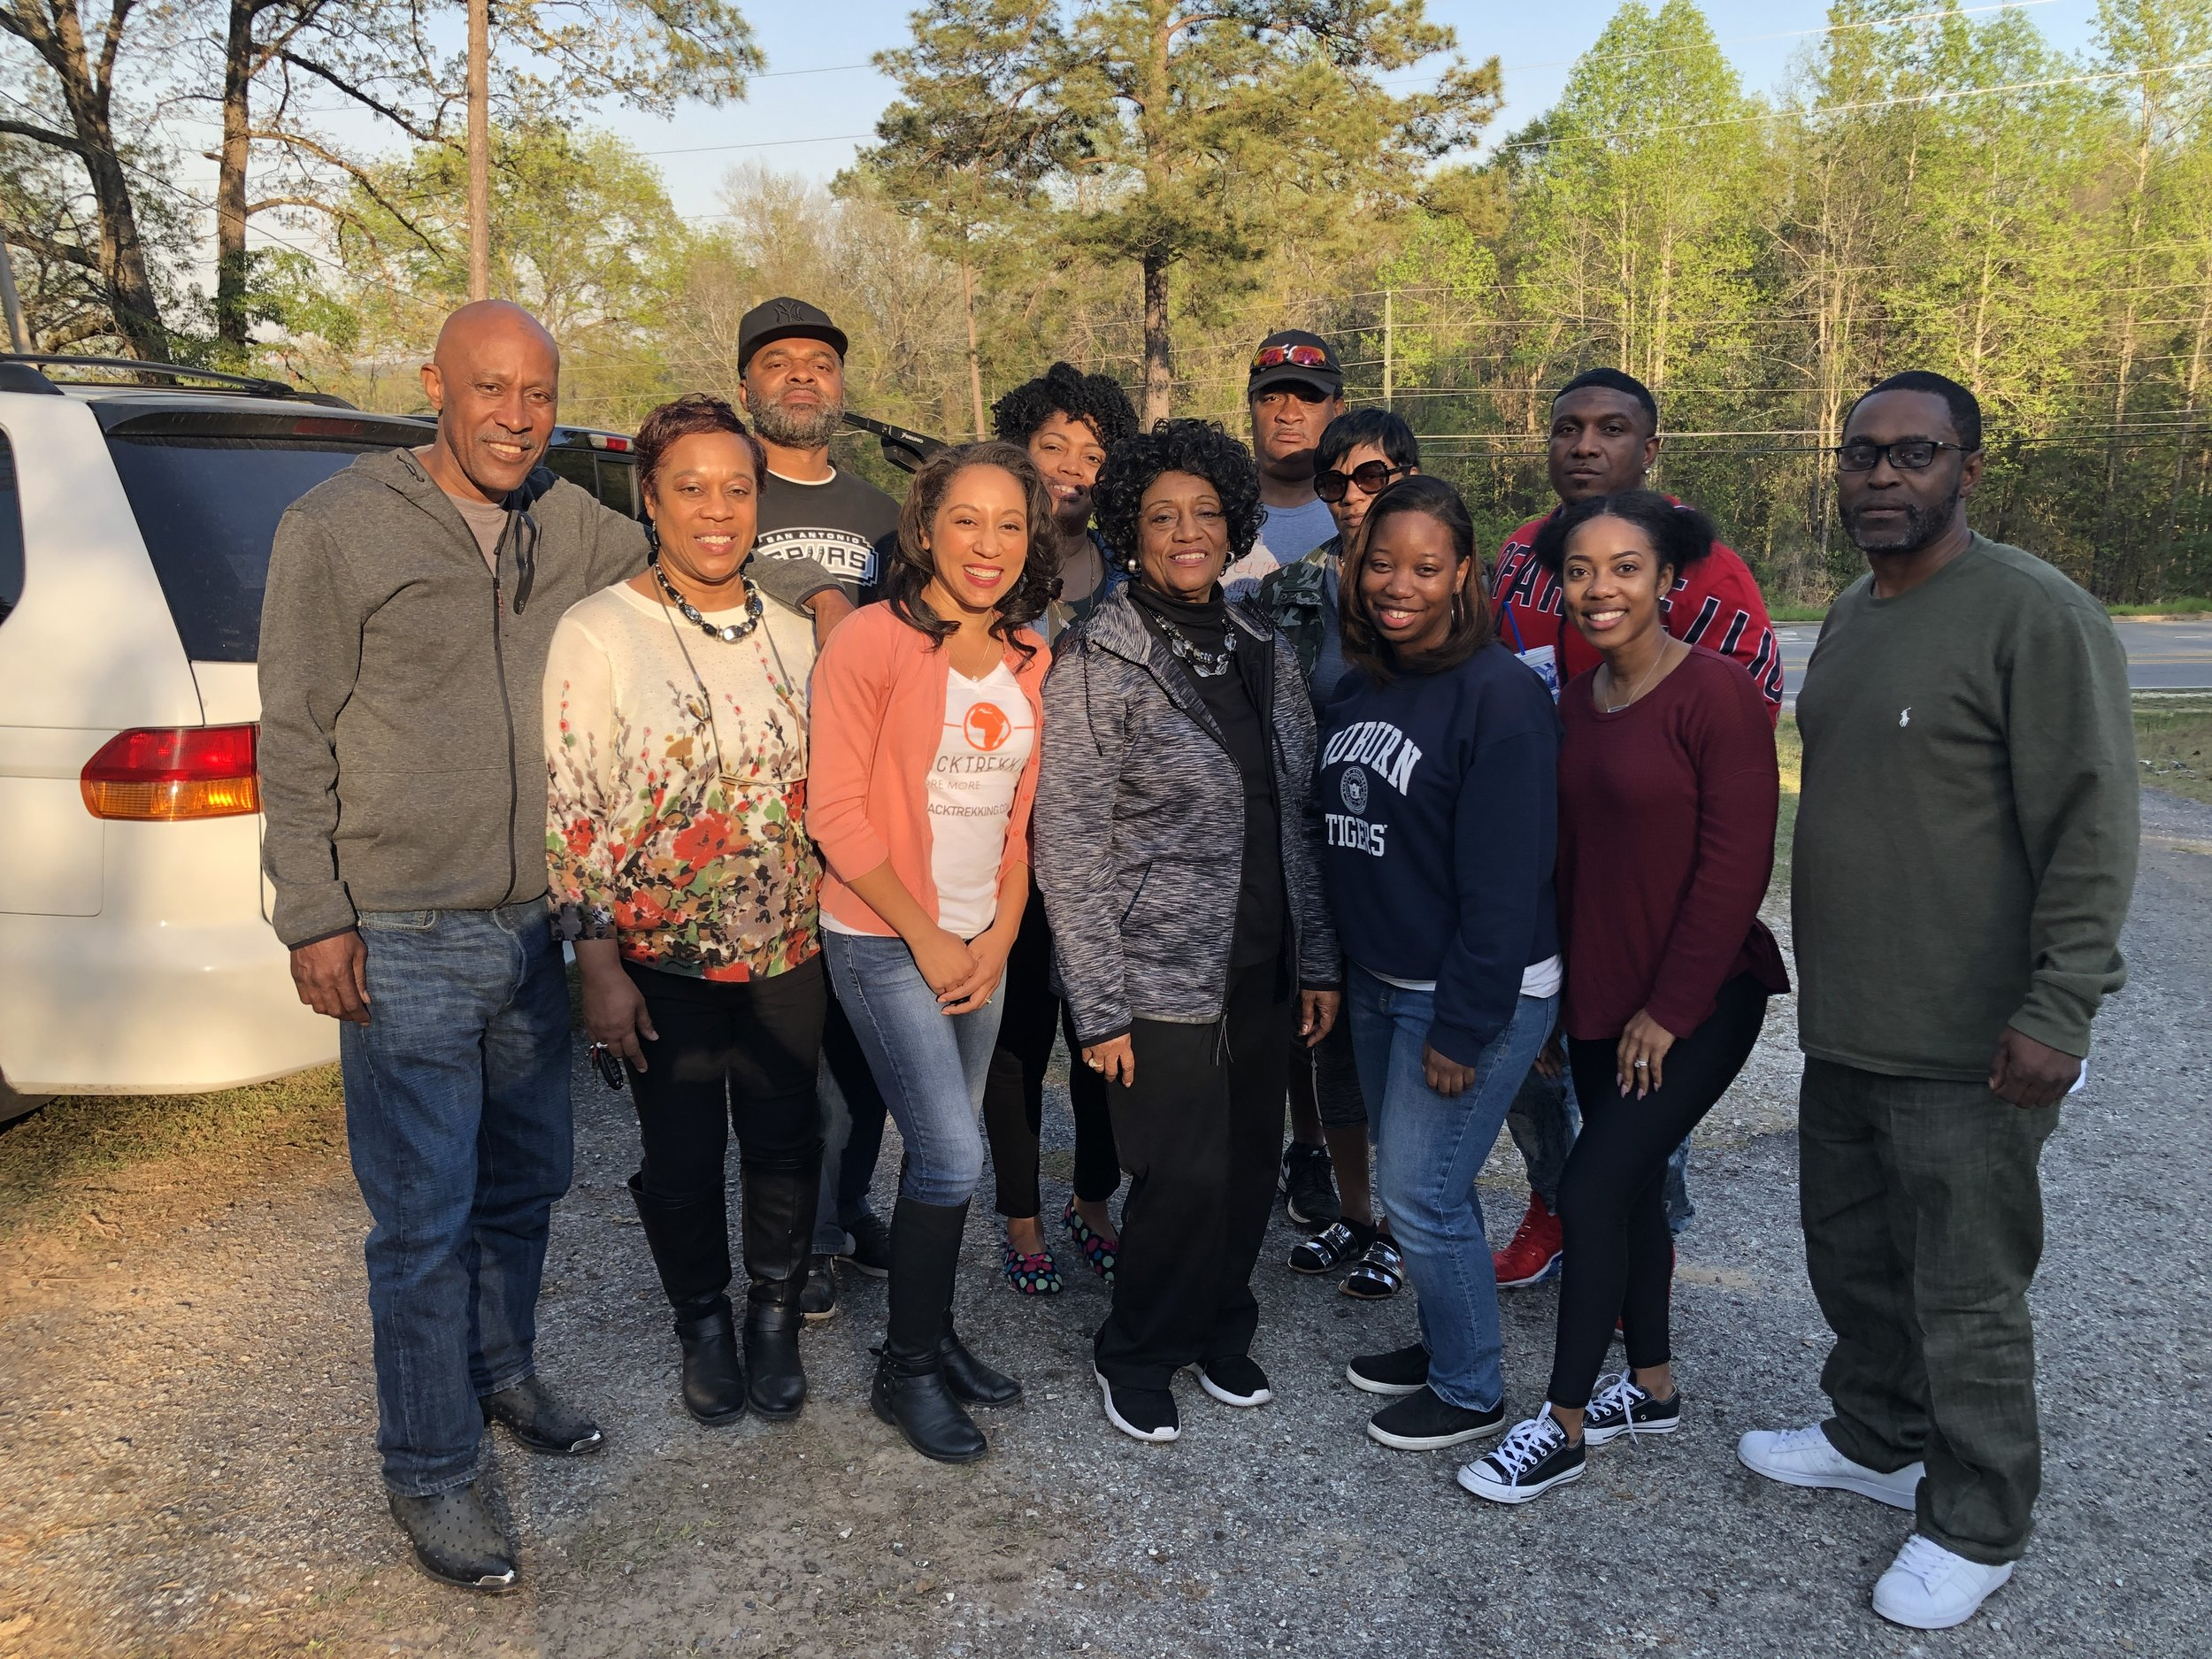 My Alabama cousins- the Menifees